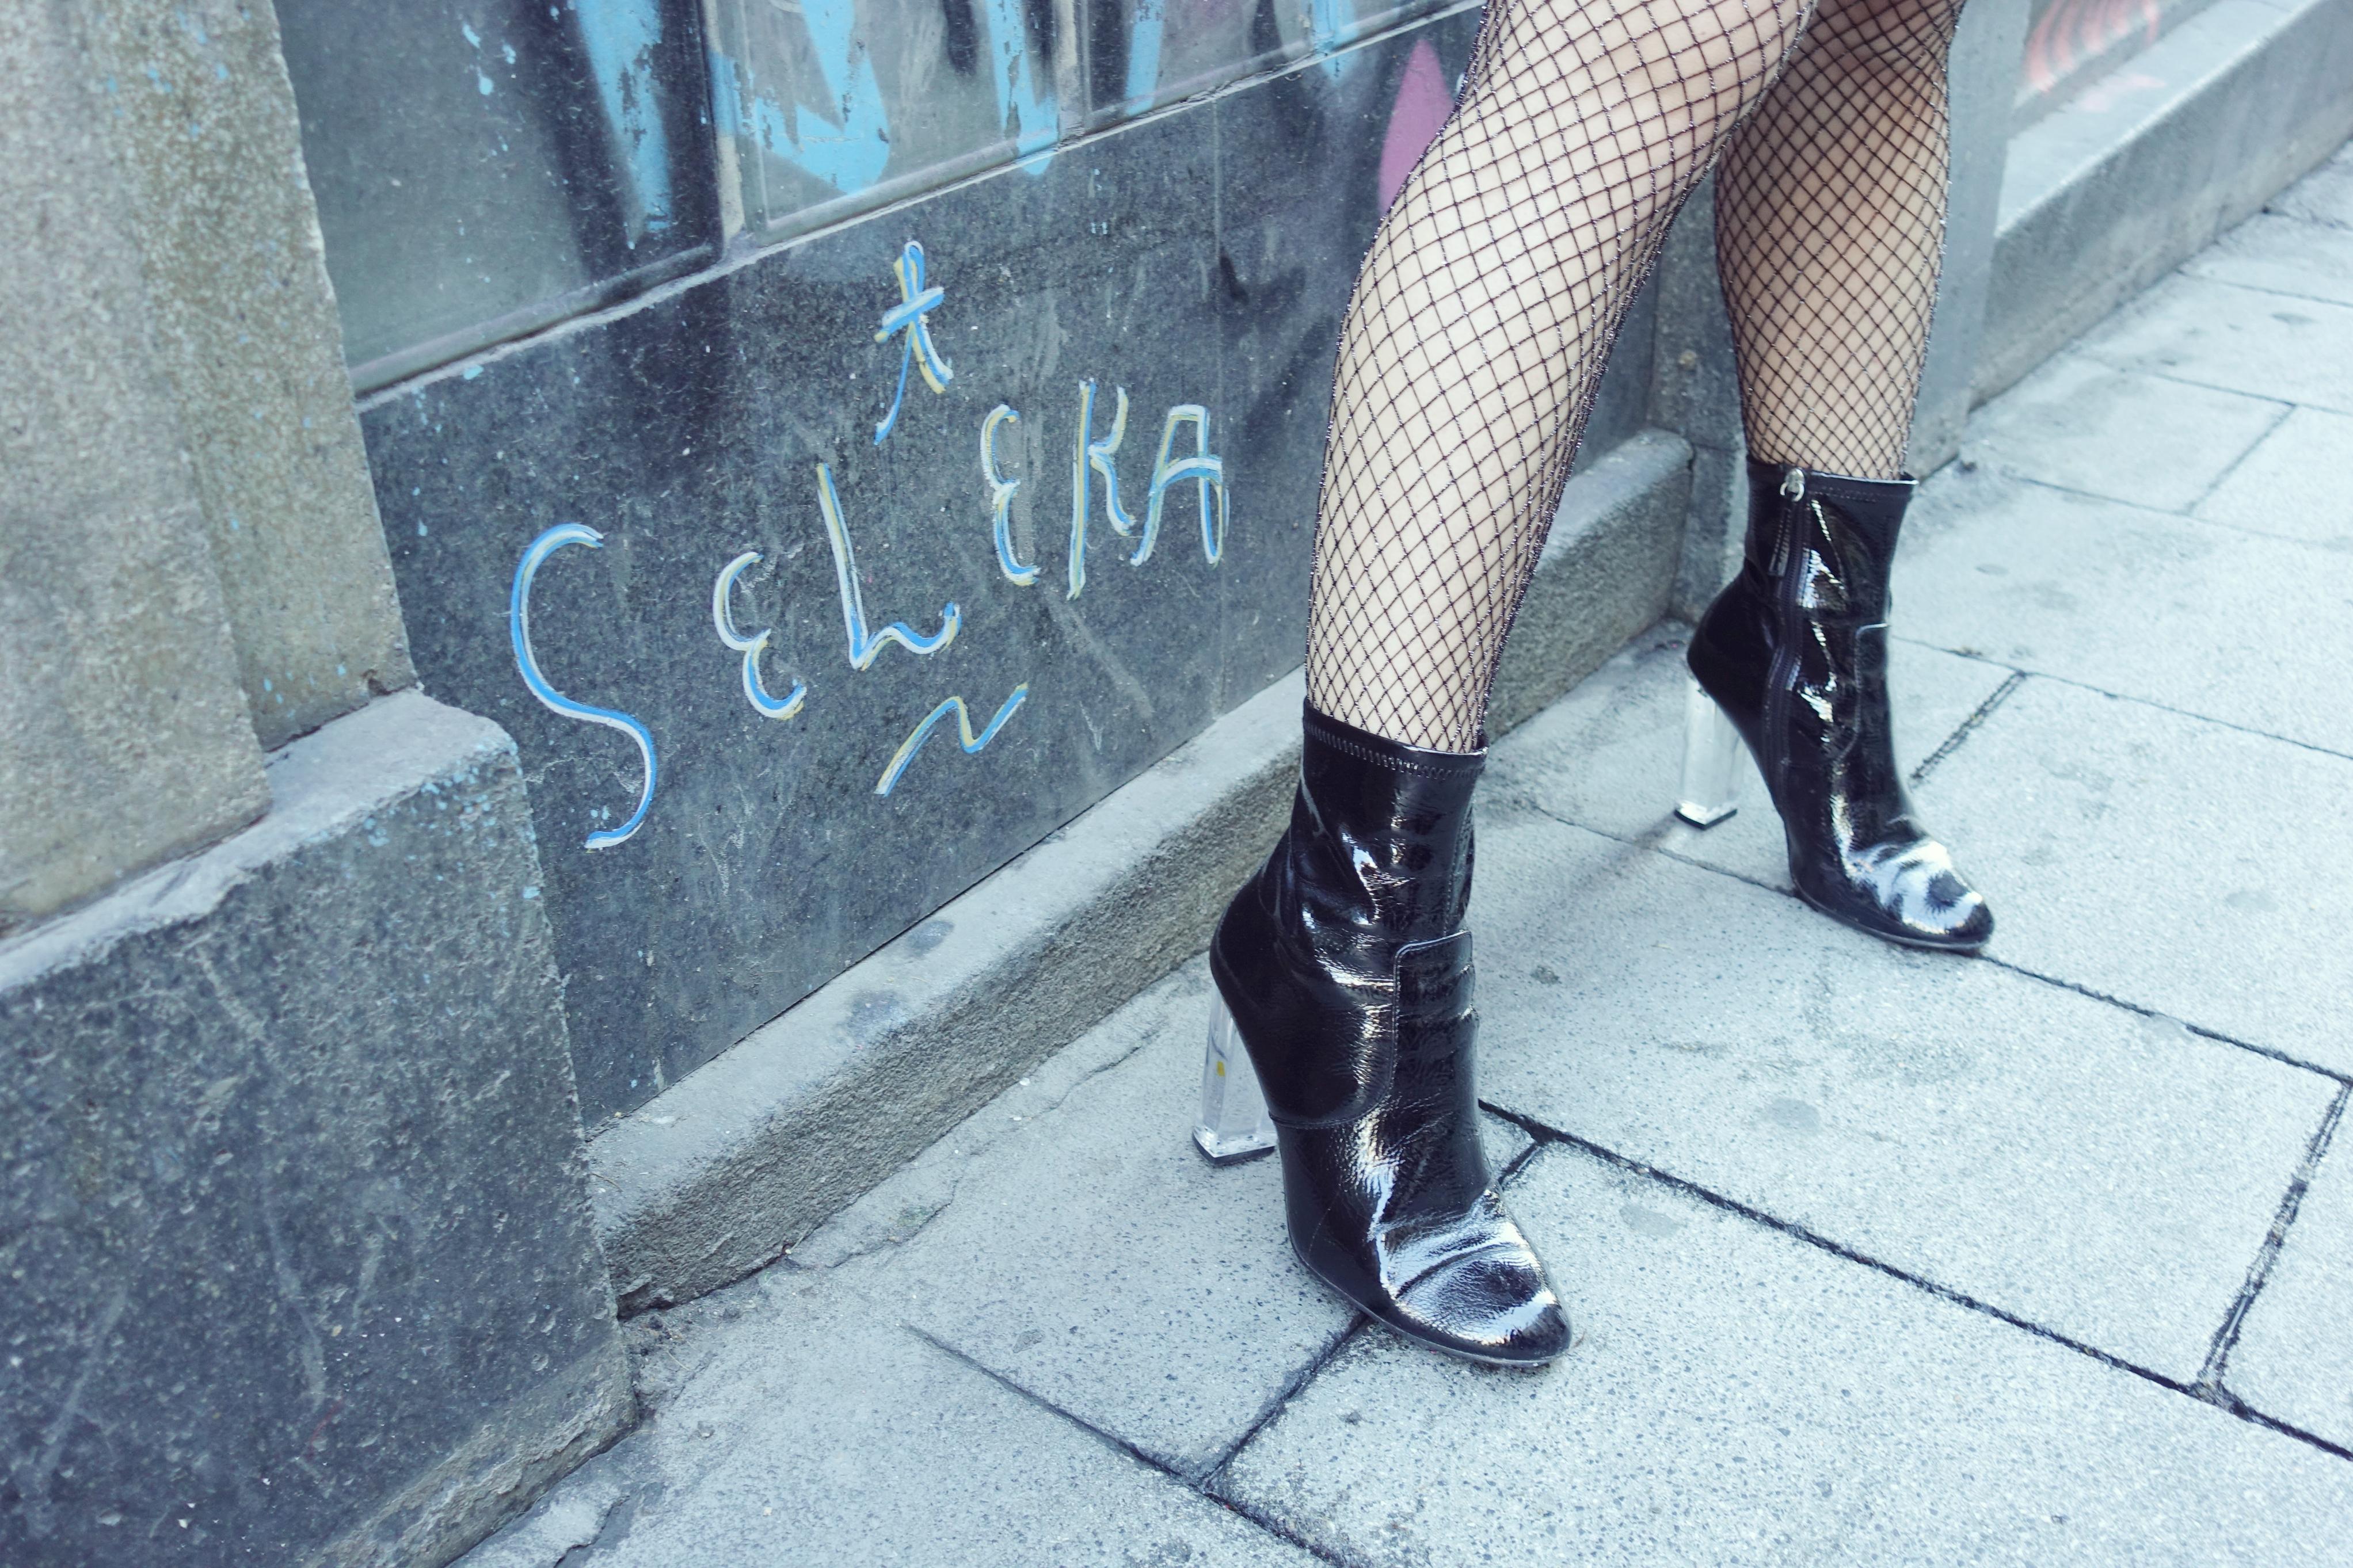 stevemadden-boties-blog-de-moda-Chicadicta-influencer-PiensaenChic-fashionista-botines-negros-Chic-adicta-madrid-fashion-Piensa-en-Chic